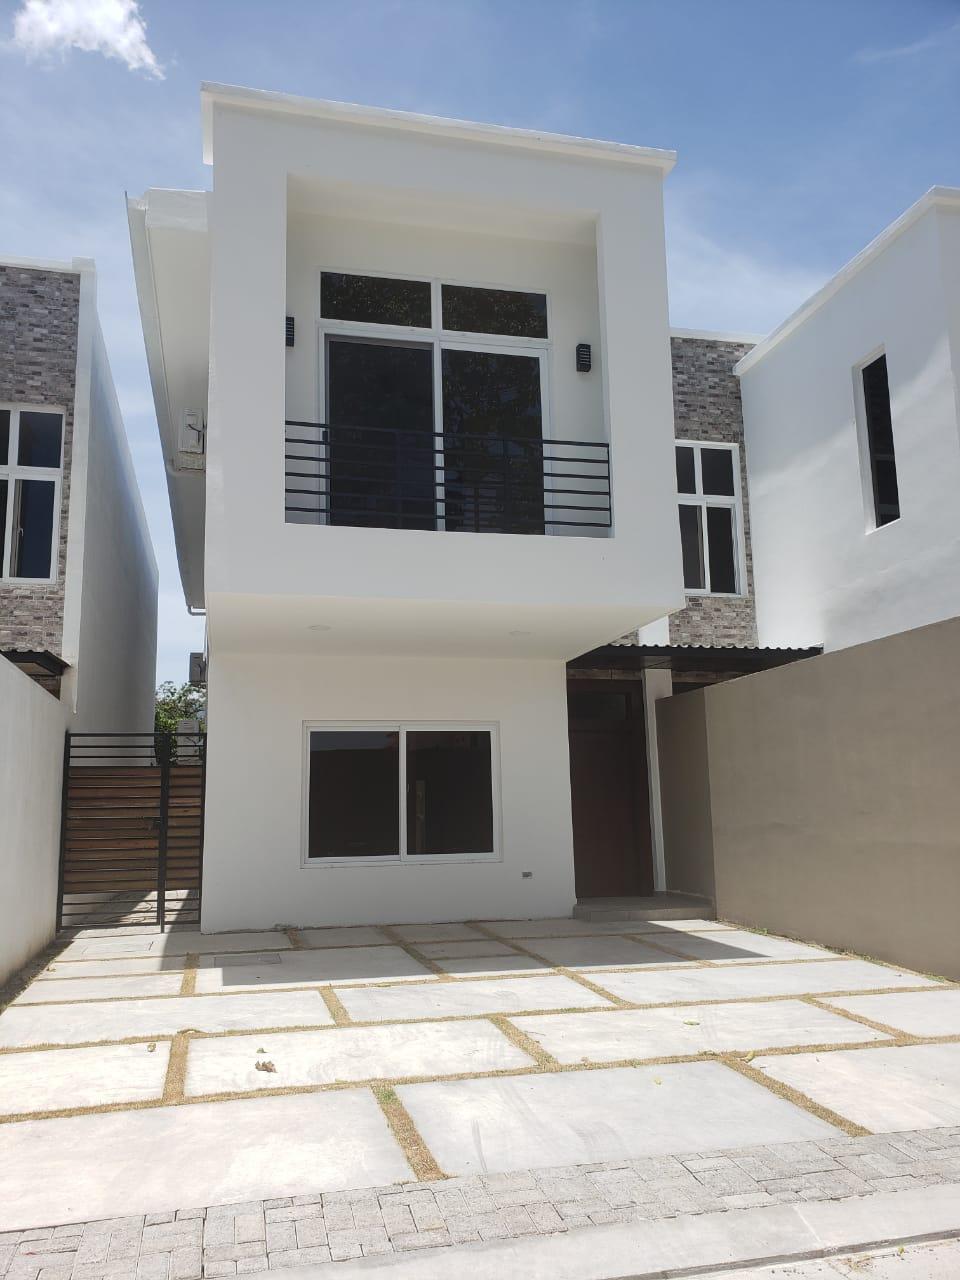 Se venden lindas casas listas para entrega en El Barrial #SPS #Honduras